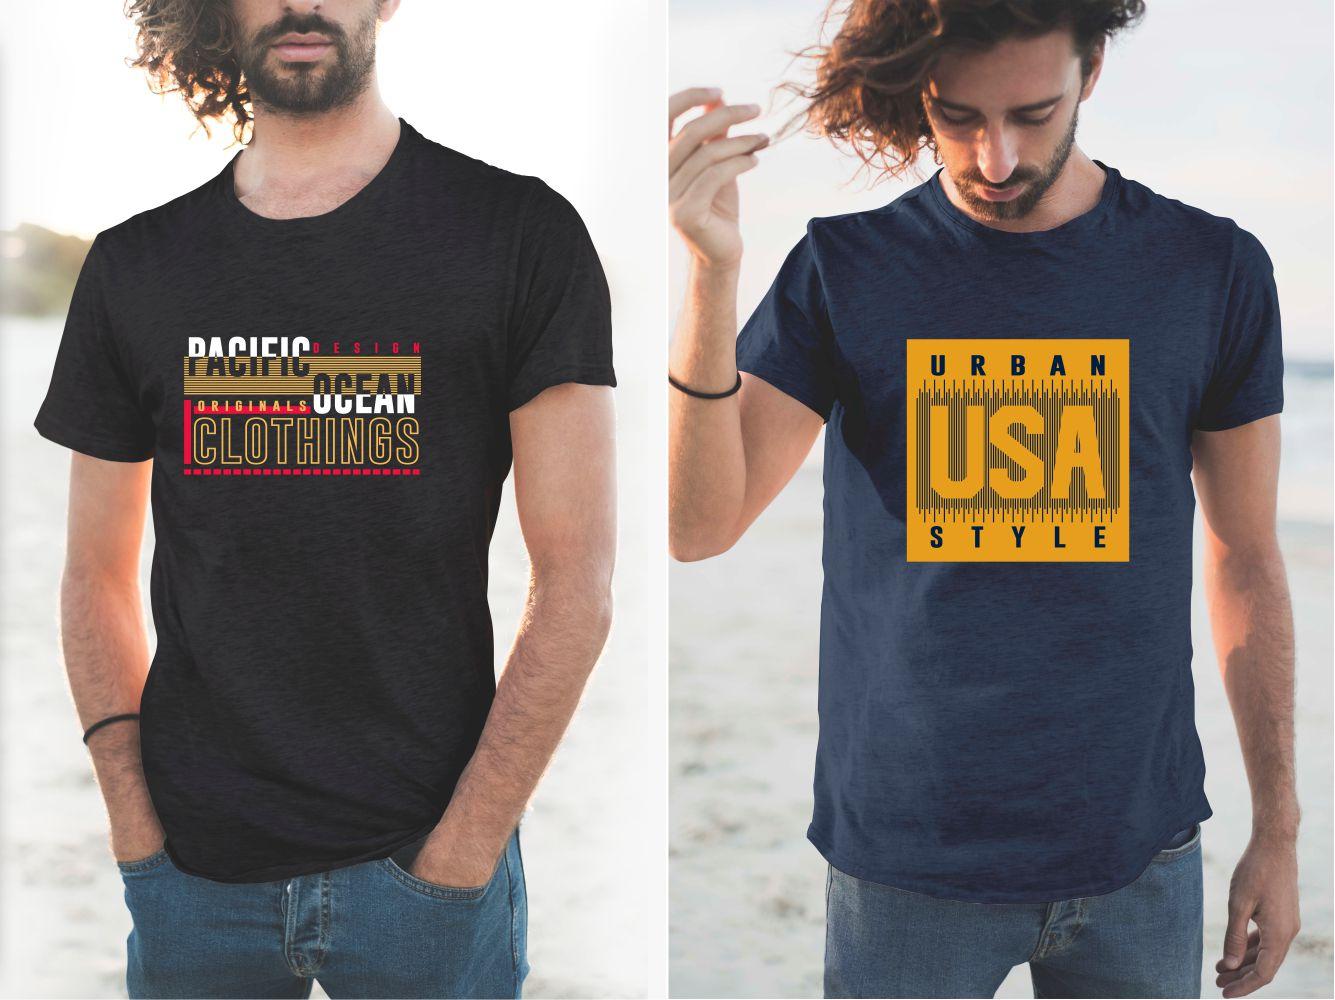 106 Urban T-shirt Designs Collection - 34 1